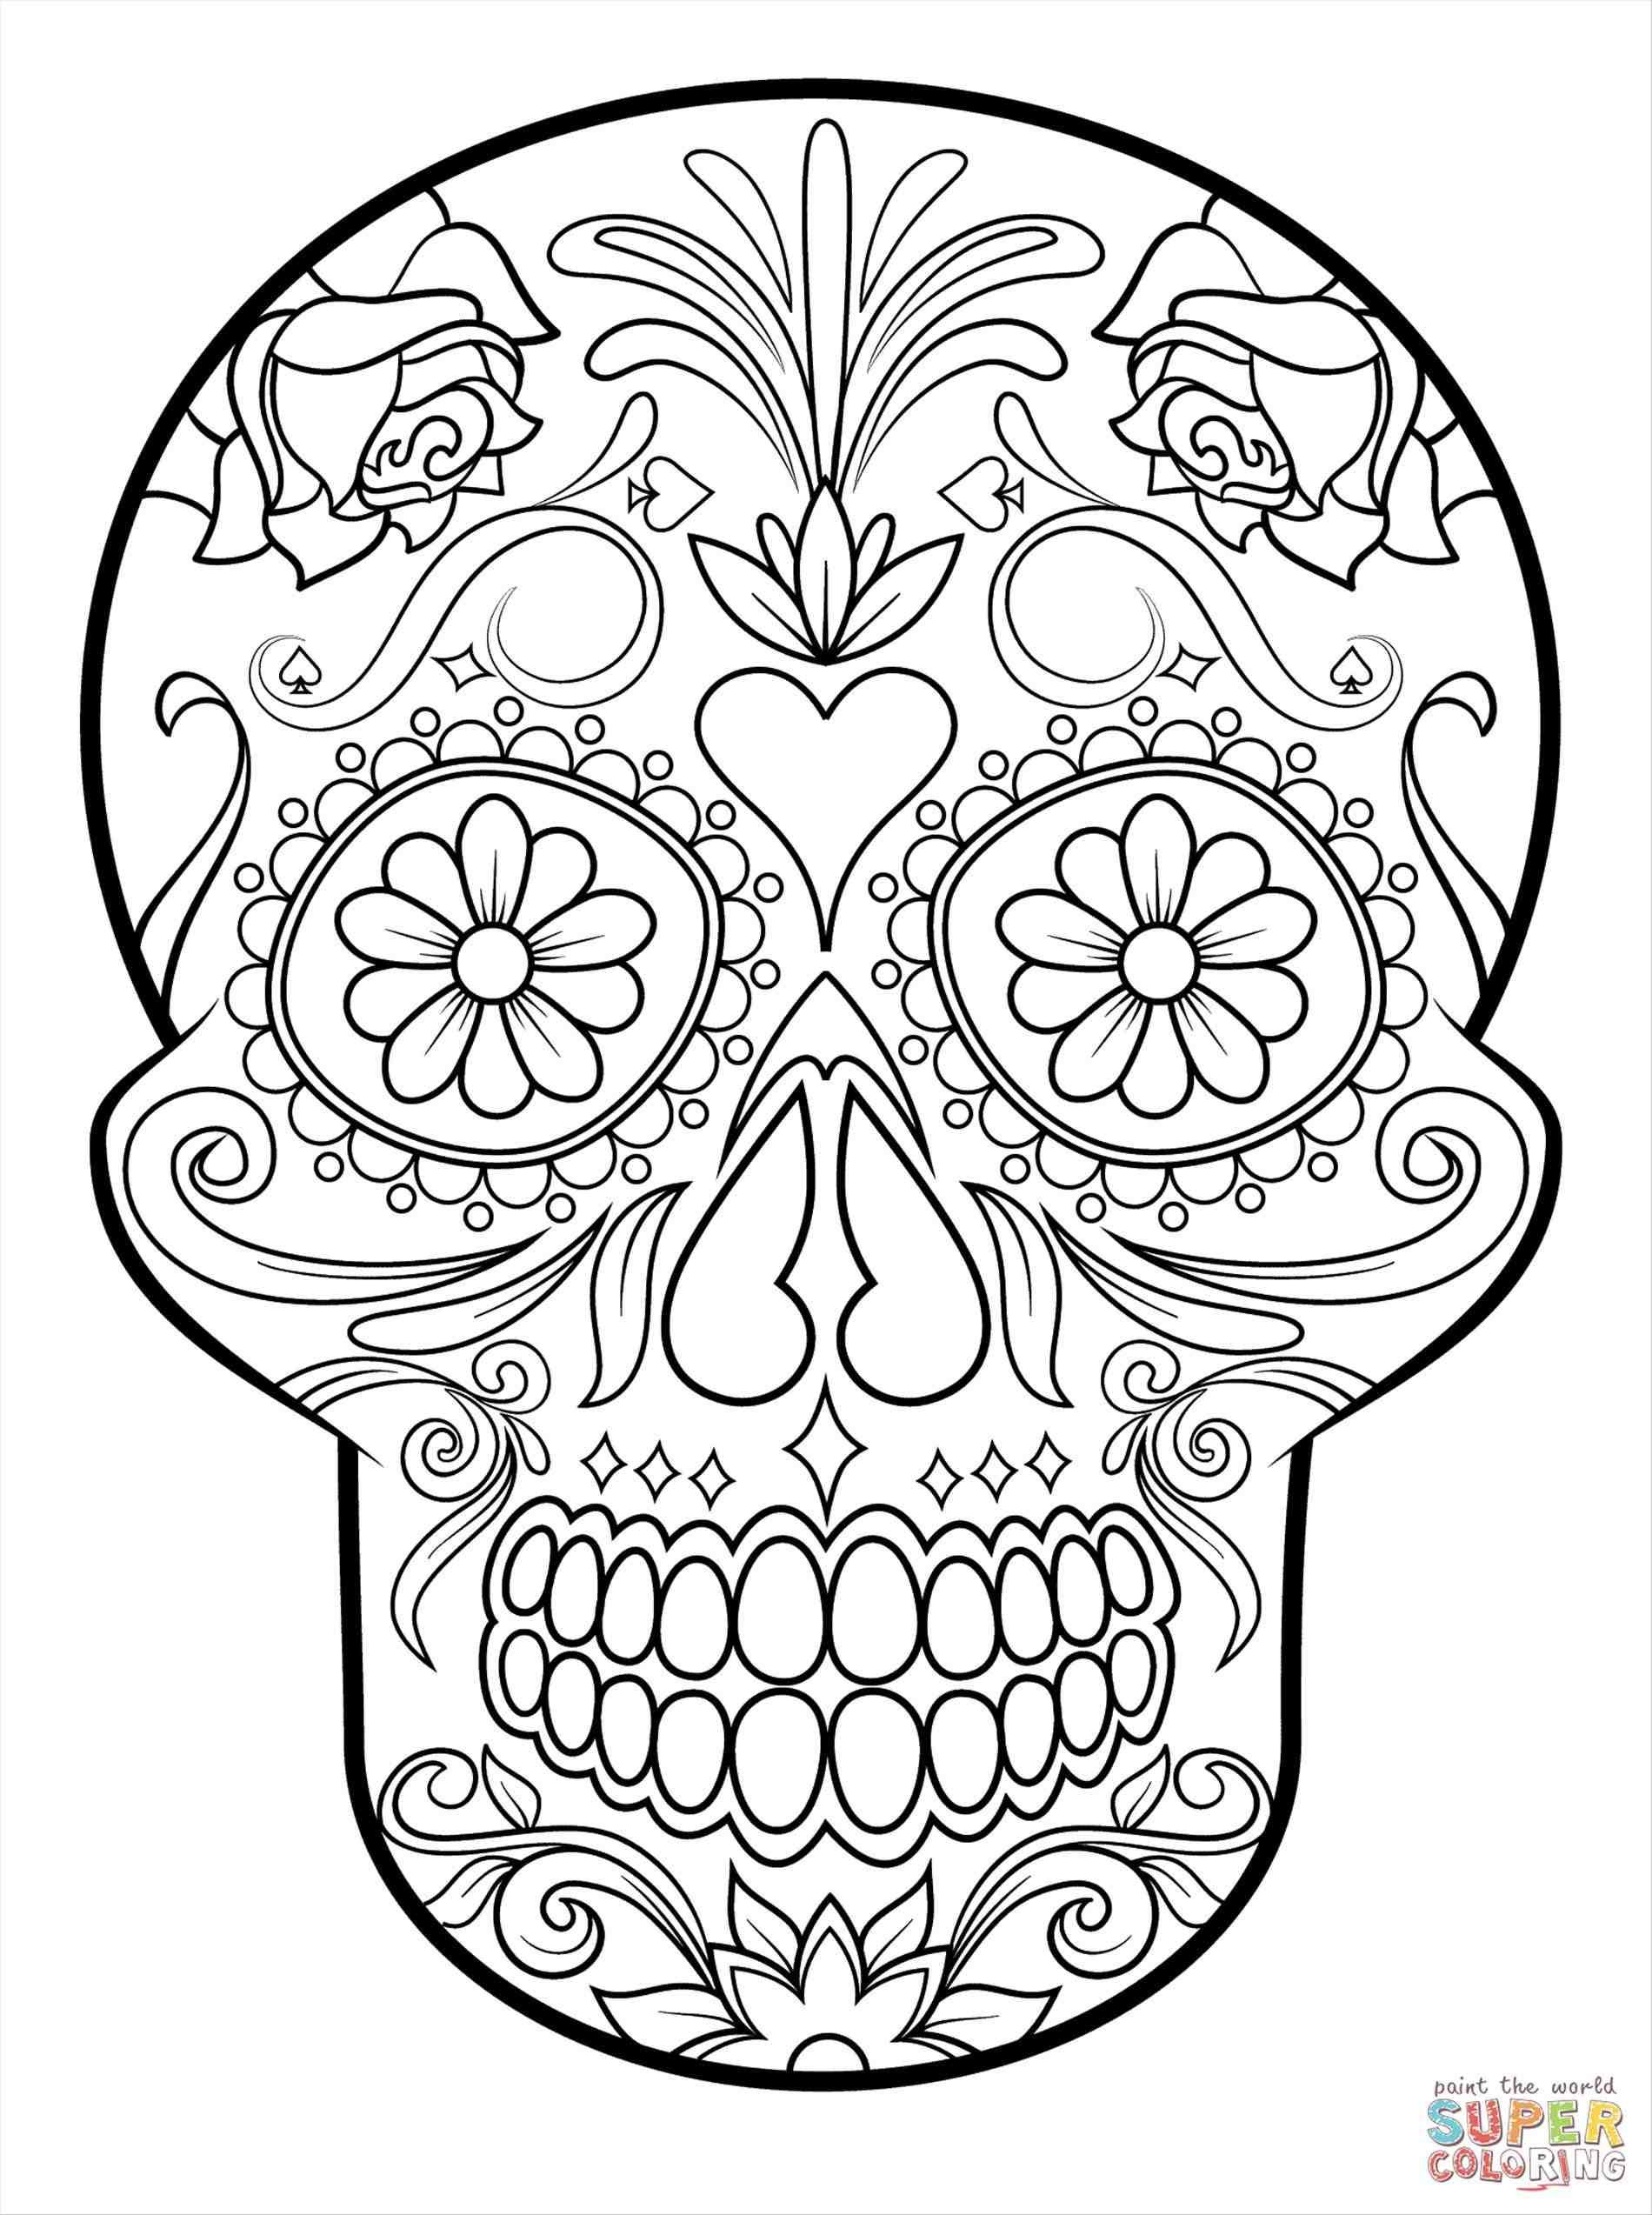 1900x2547 Download Image Creatinu Sugar Skull Drawing Tutorial. Step 5. How